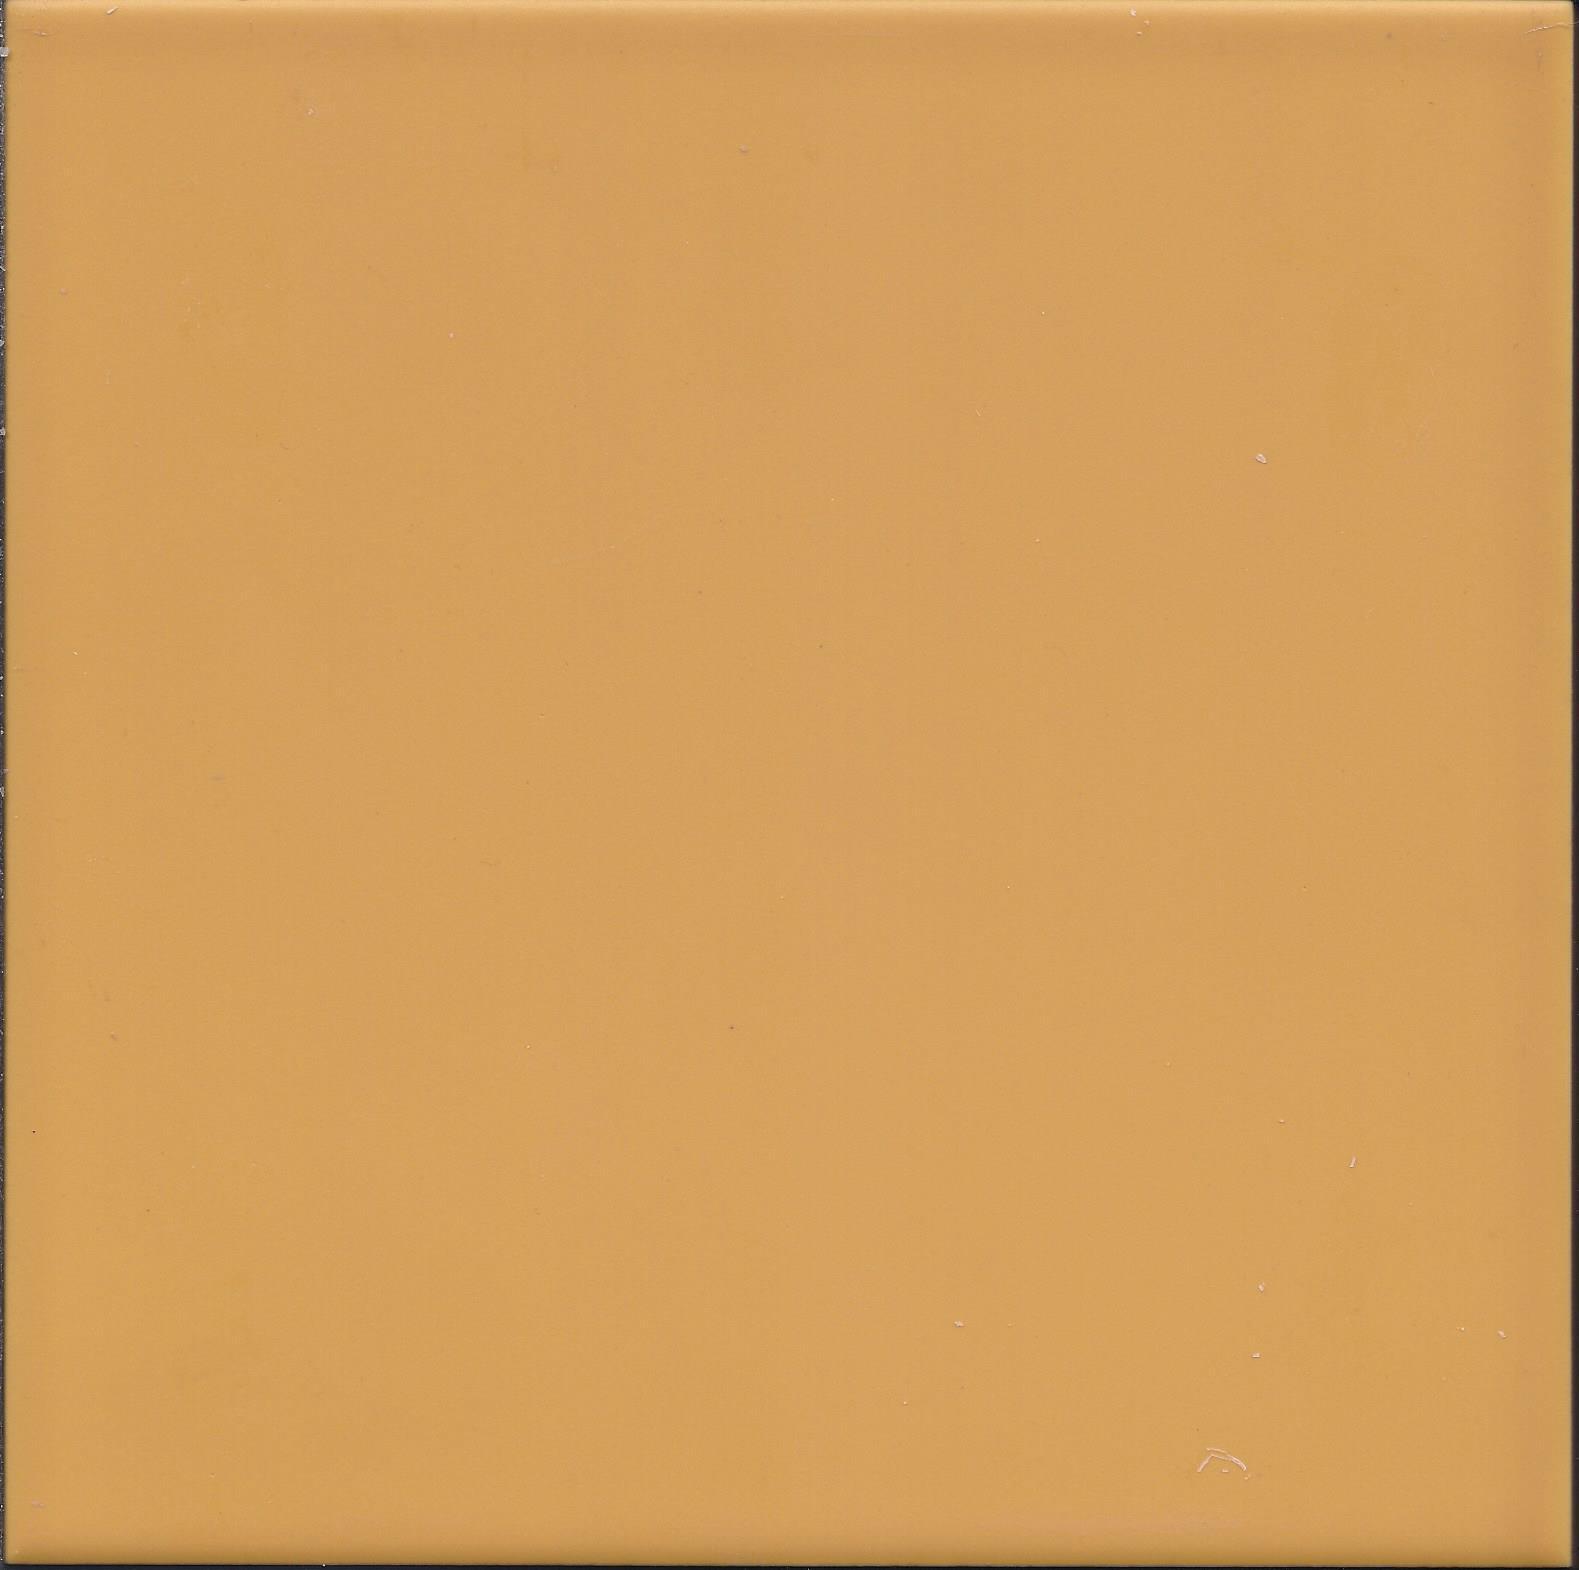 Vintage unikleur geel vloertegel 20 x 20 cm per m2 online bestellen   TEGELinfo